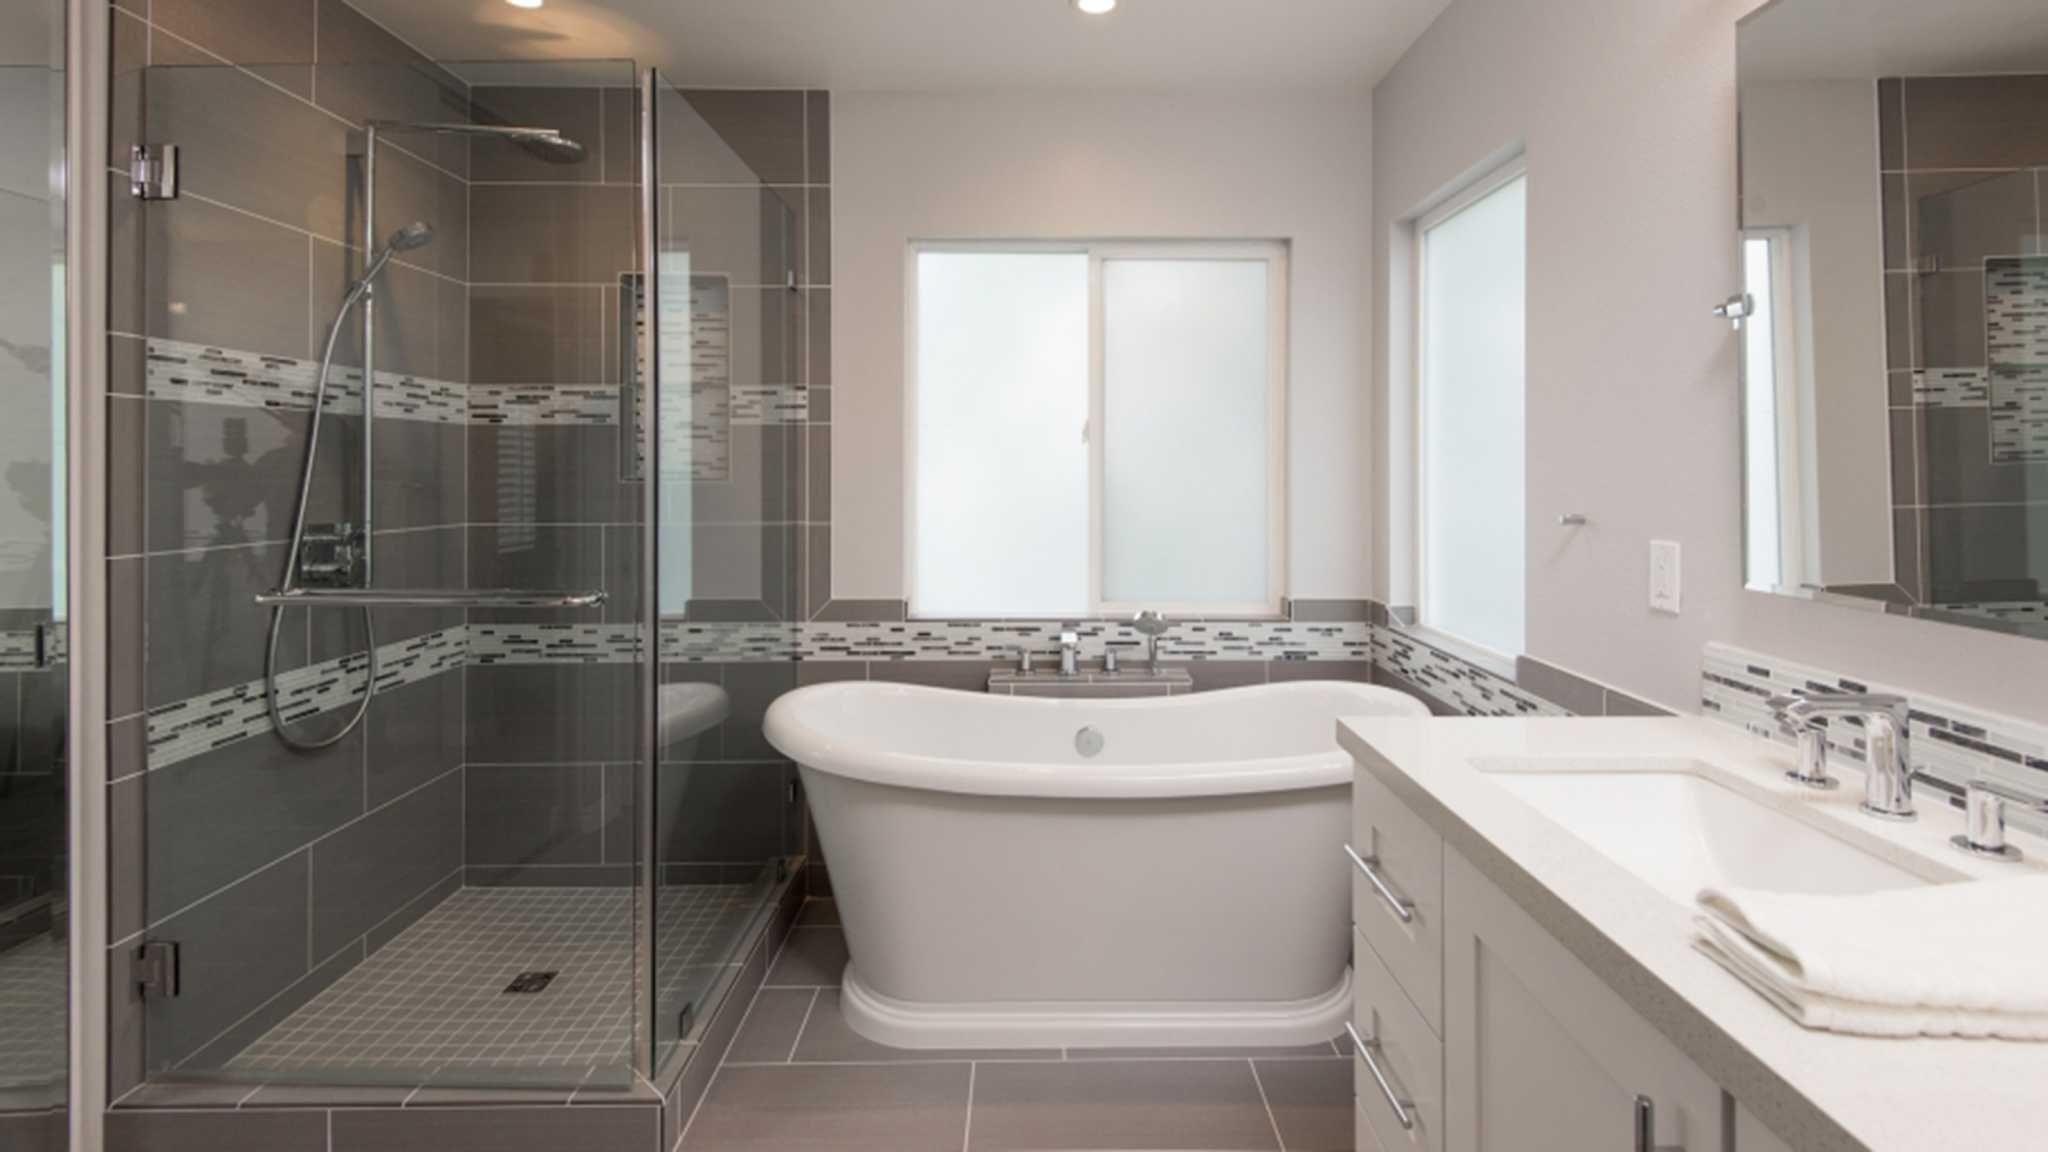 Living Smart How Much Does Bathroom Tile Installation Cost Tile Bathroom Small Master Bathroom Bathroom Cost